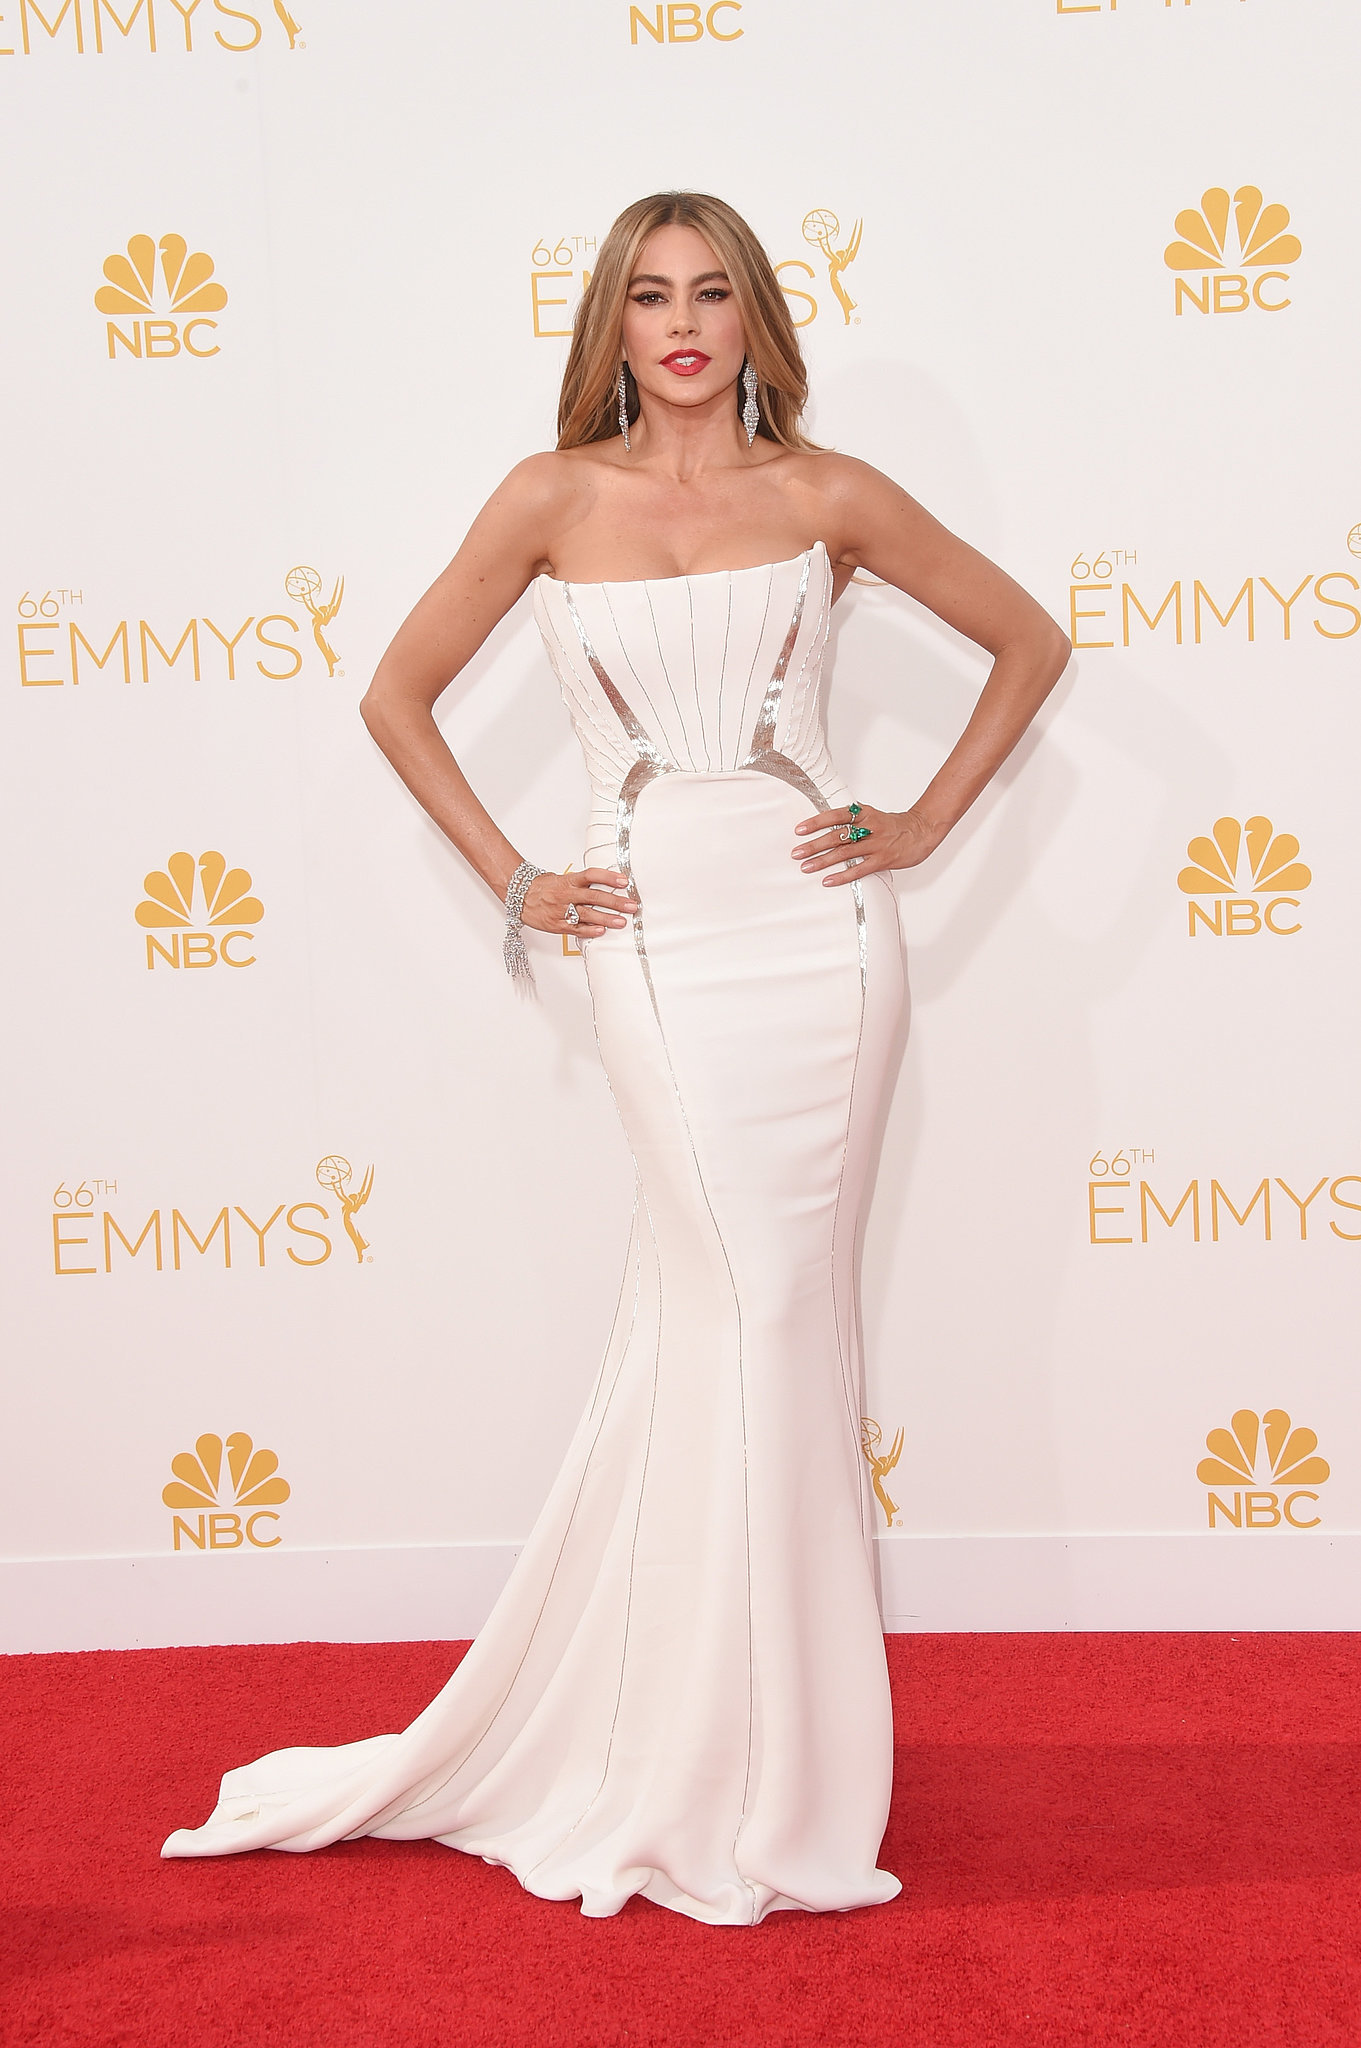 Sofia Vergara in a white strapless Roberto Cavalli gown and Lorraine Schwartz Jewellery at the 2014 Emmy Awards